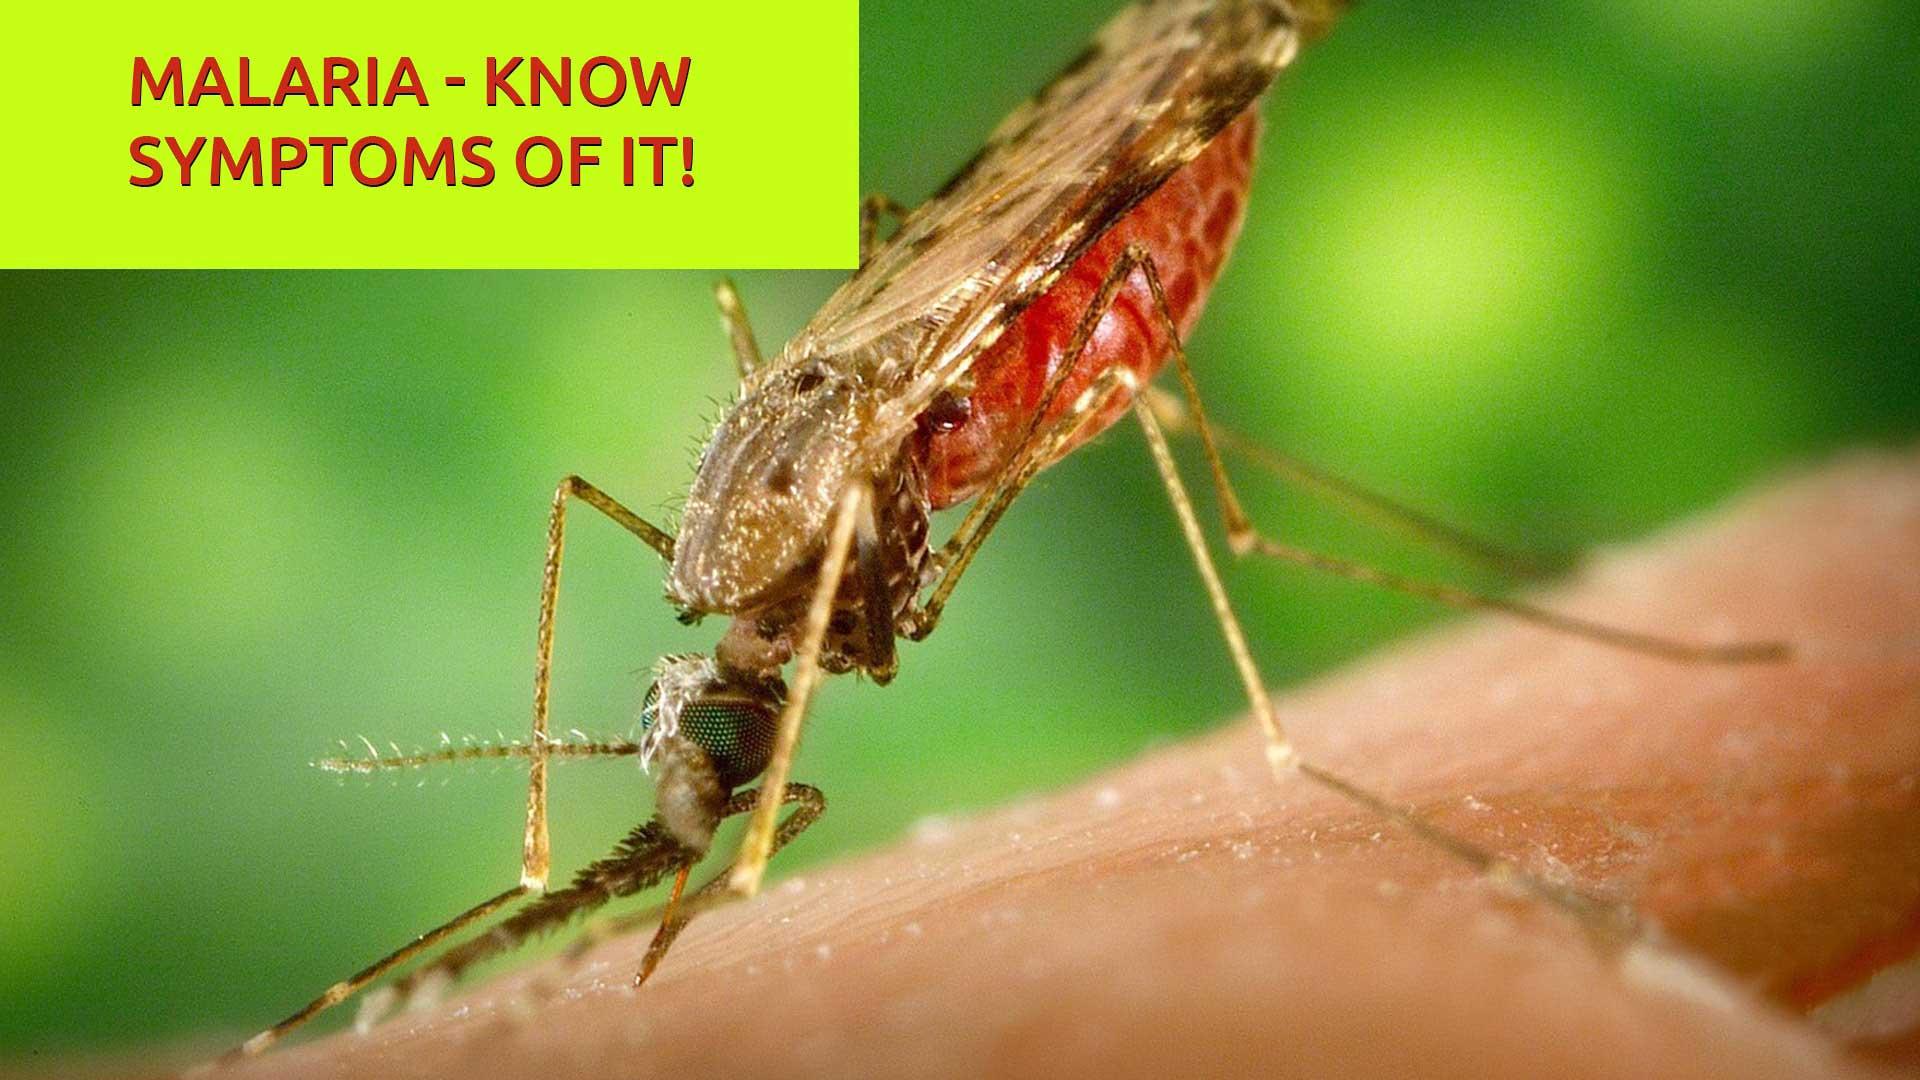 Malaria – Know symptoms of it!